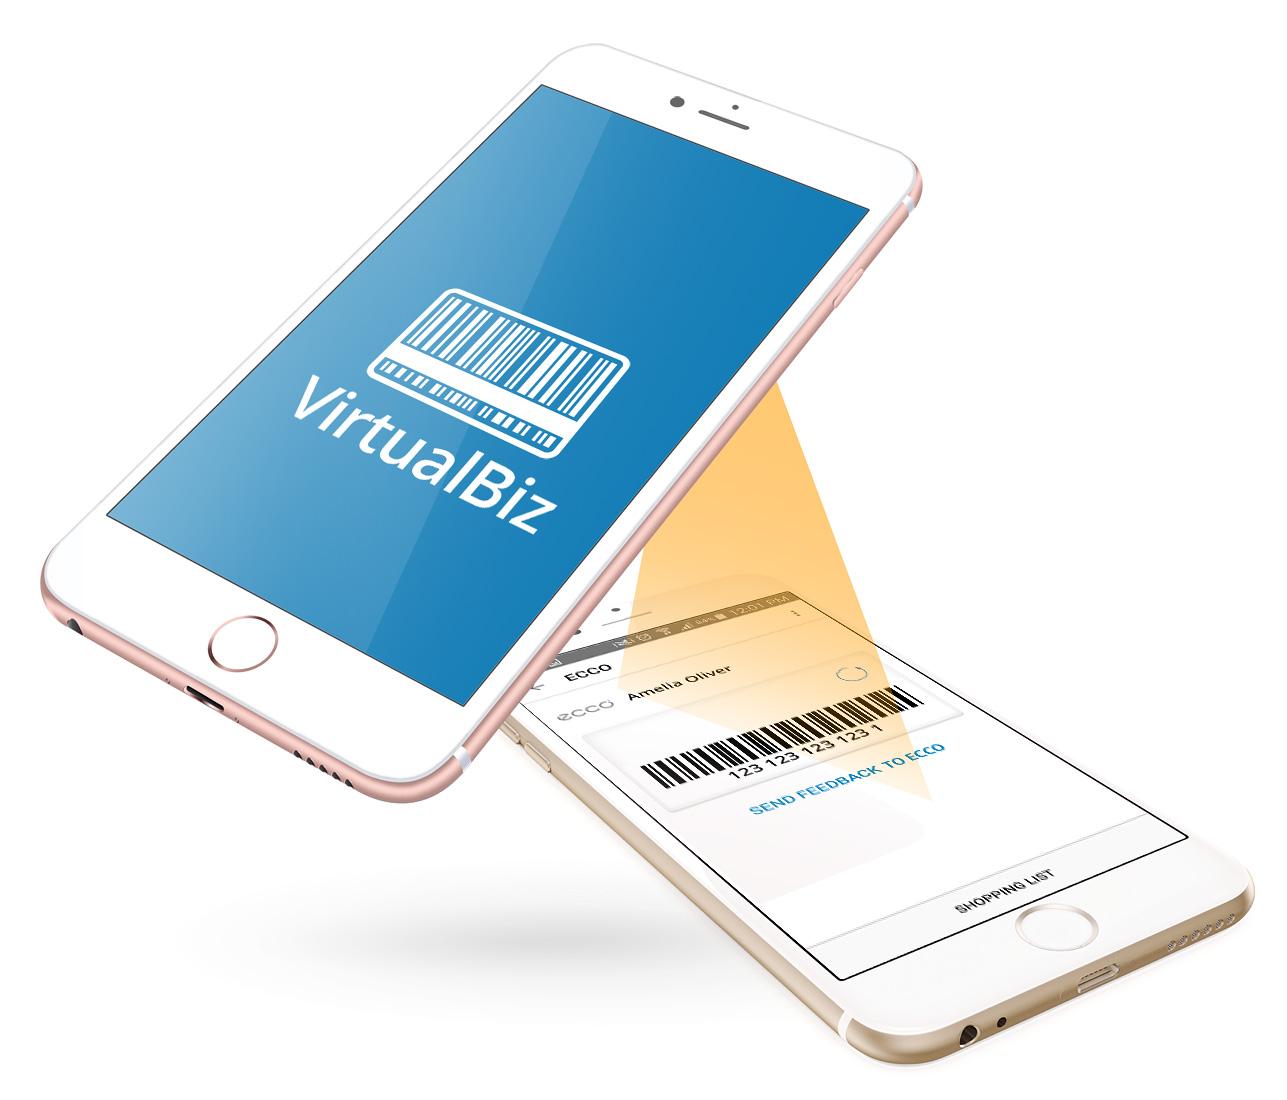 Card-scanning app